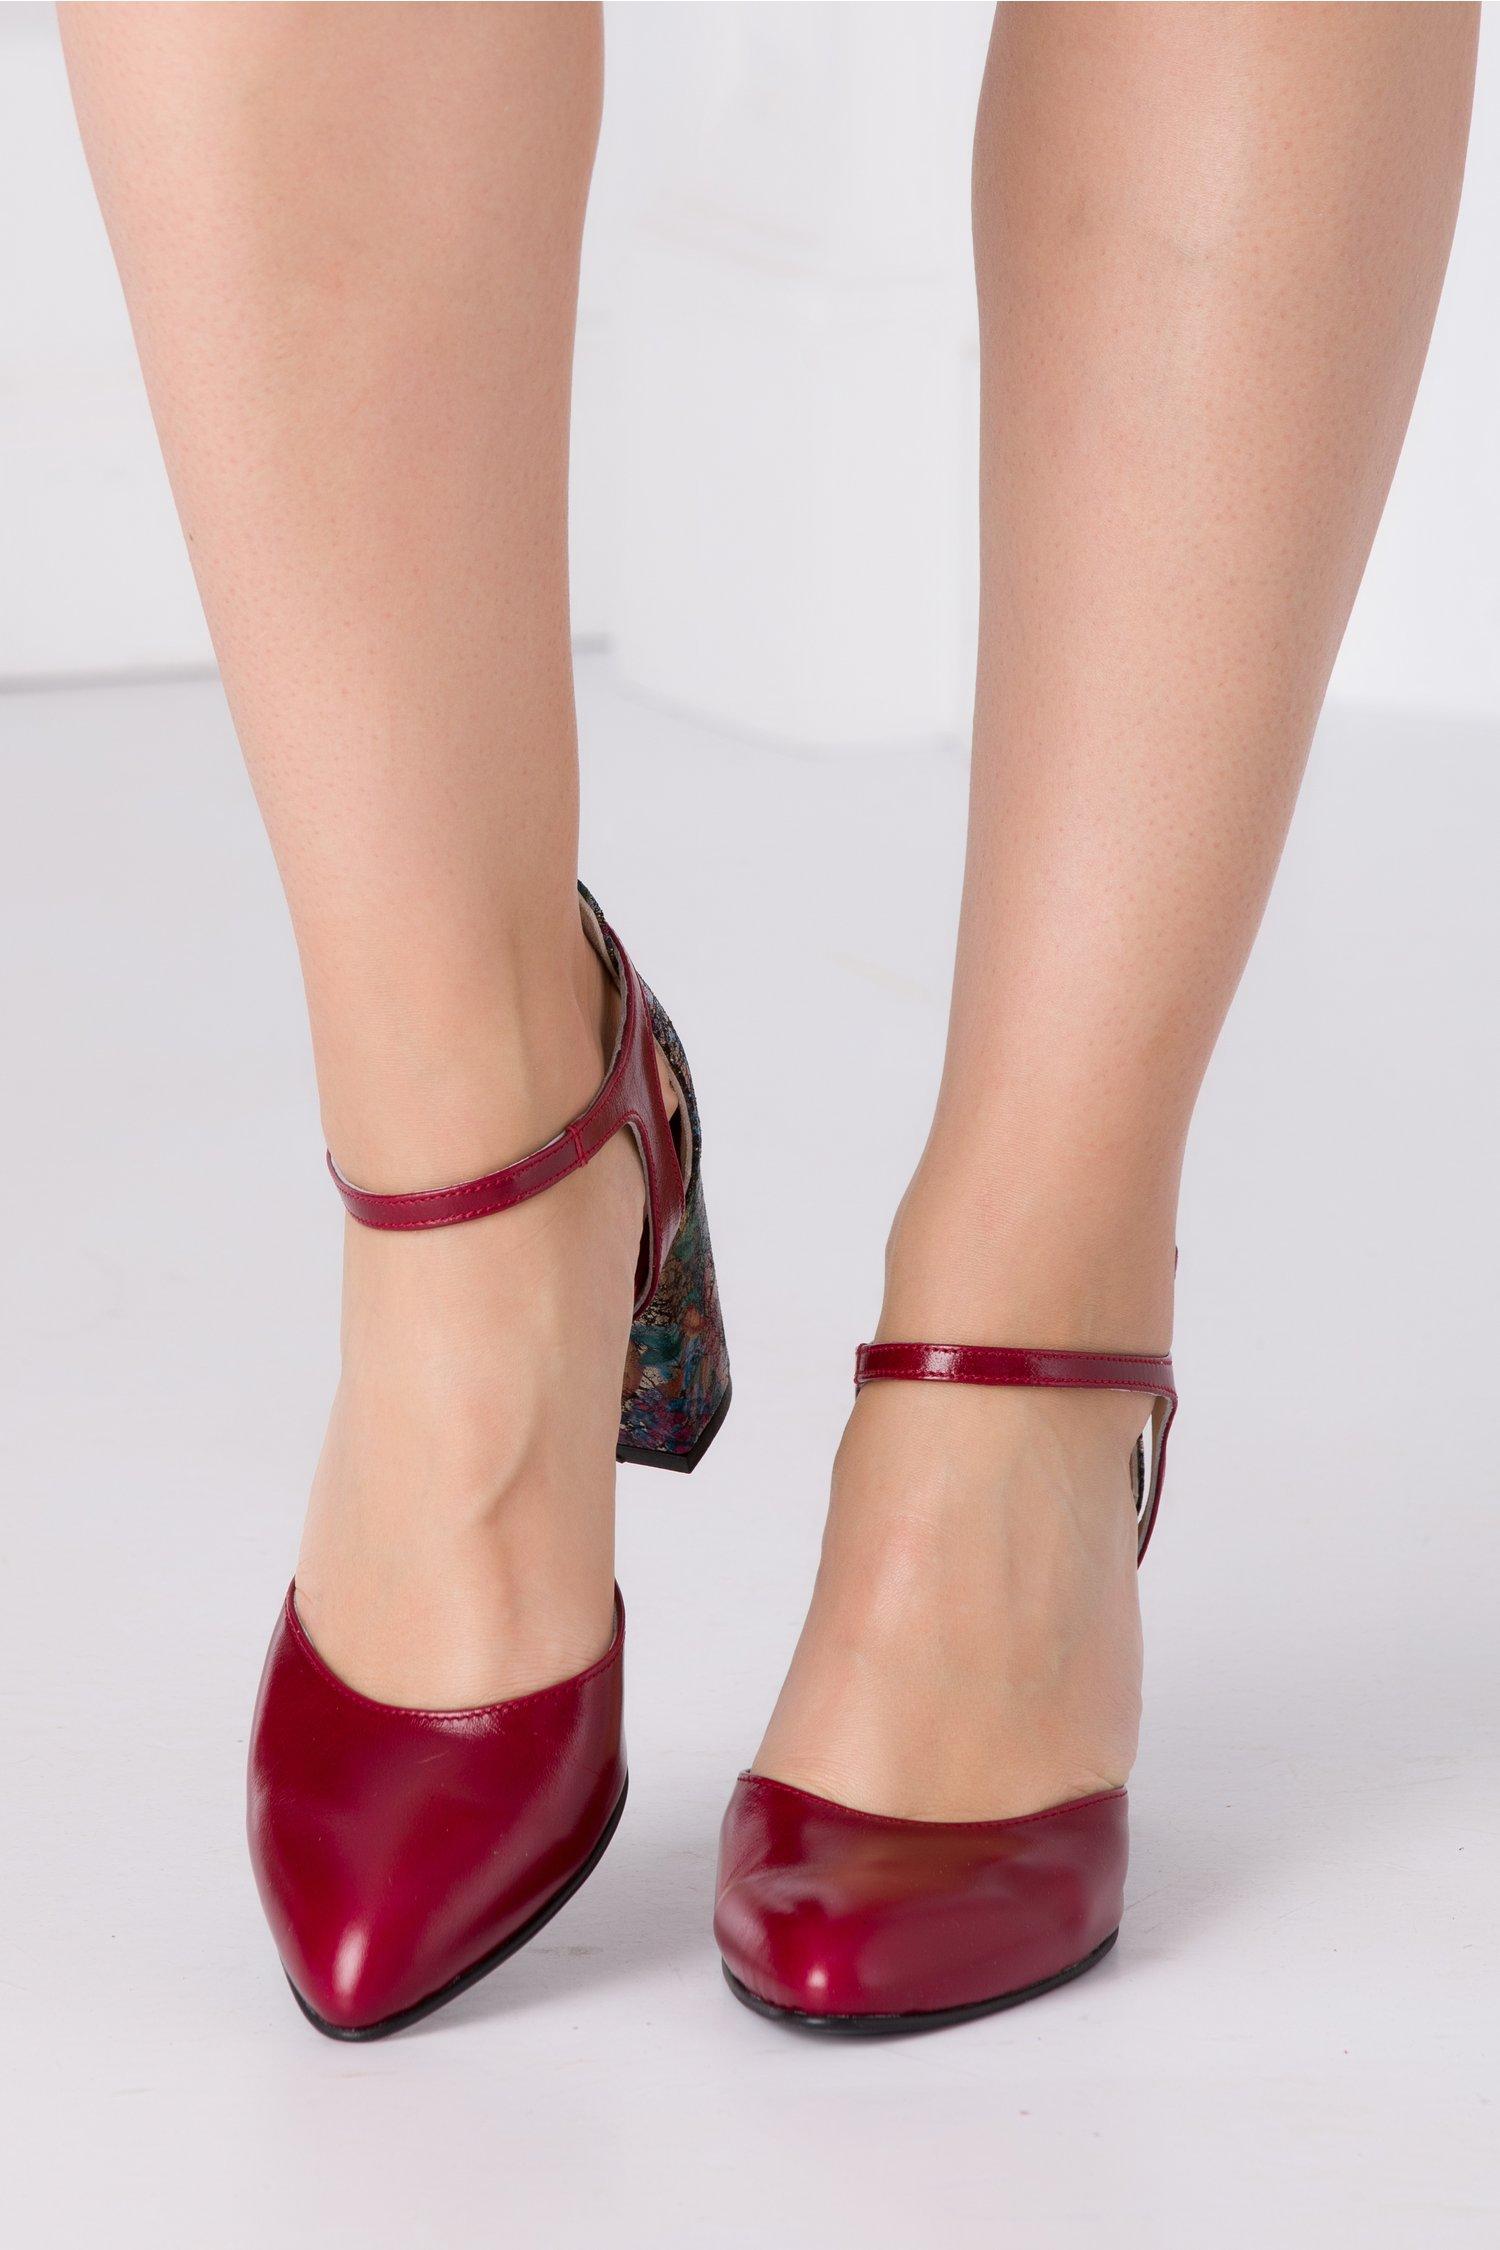 Pantofi bordo cu imprimeu floral si detalii aurii la spate